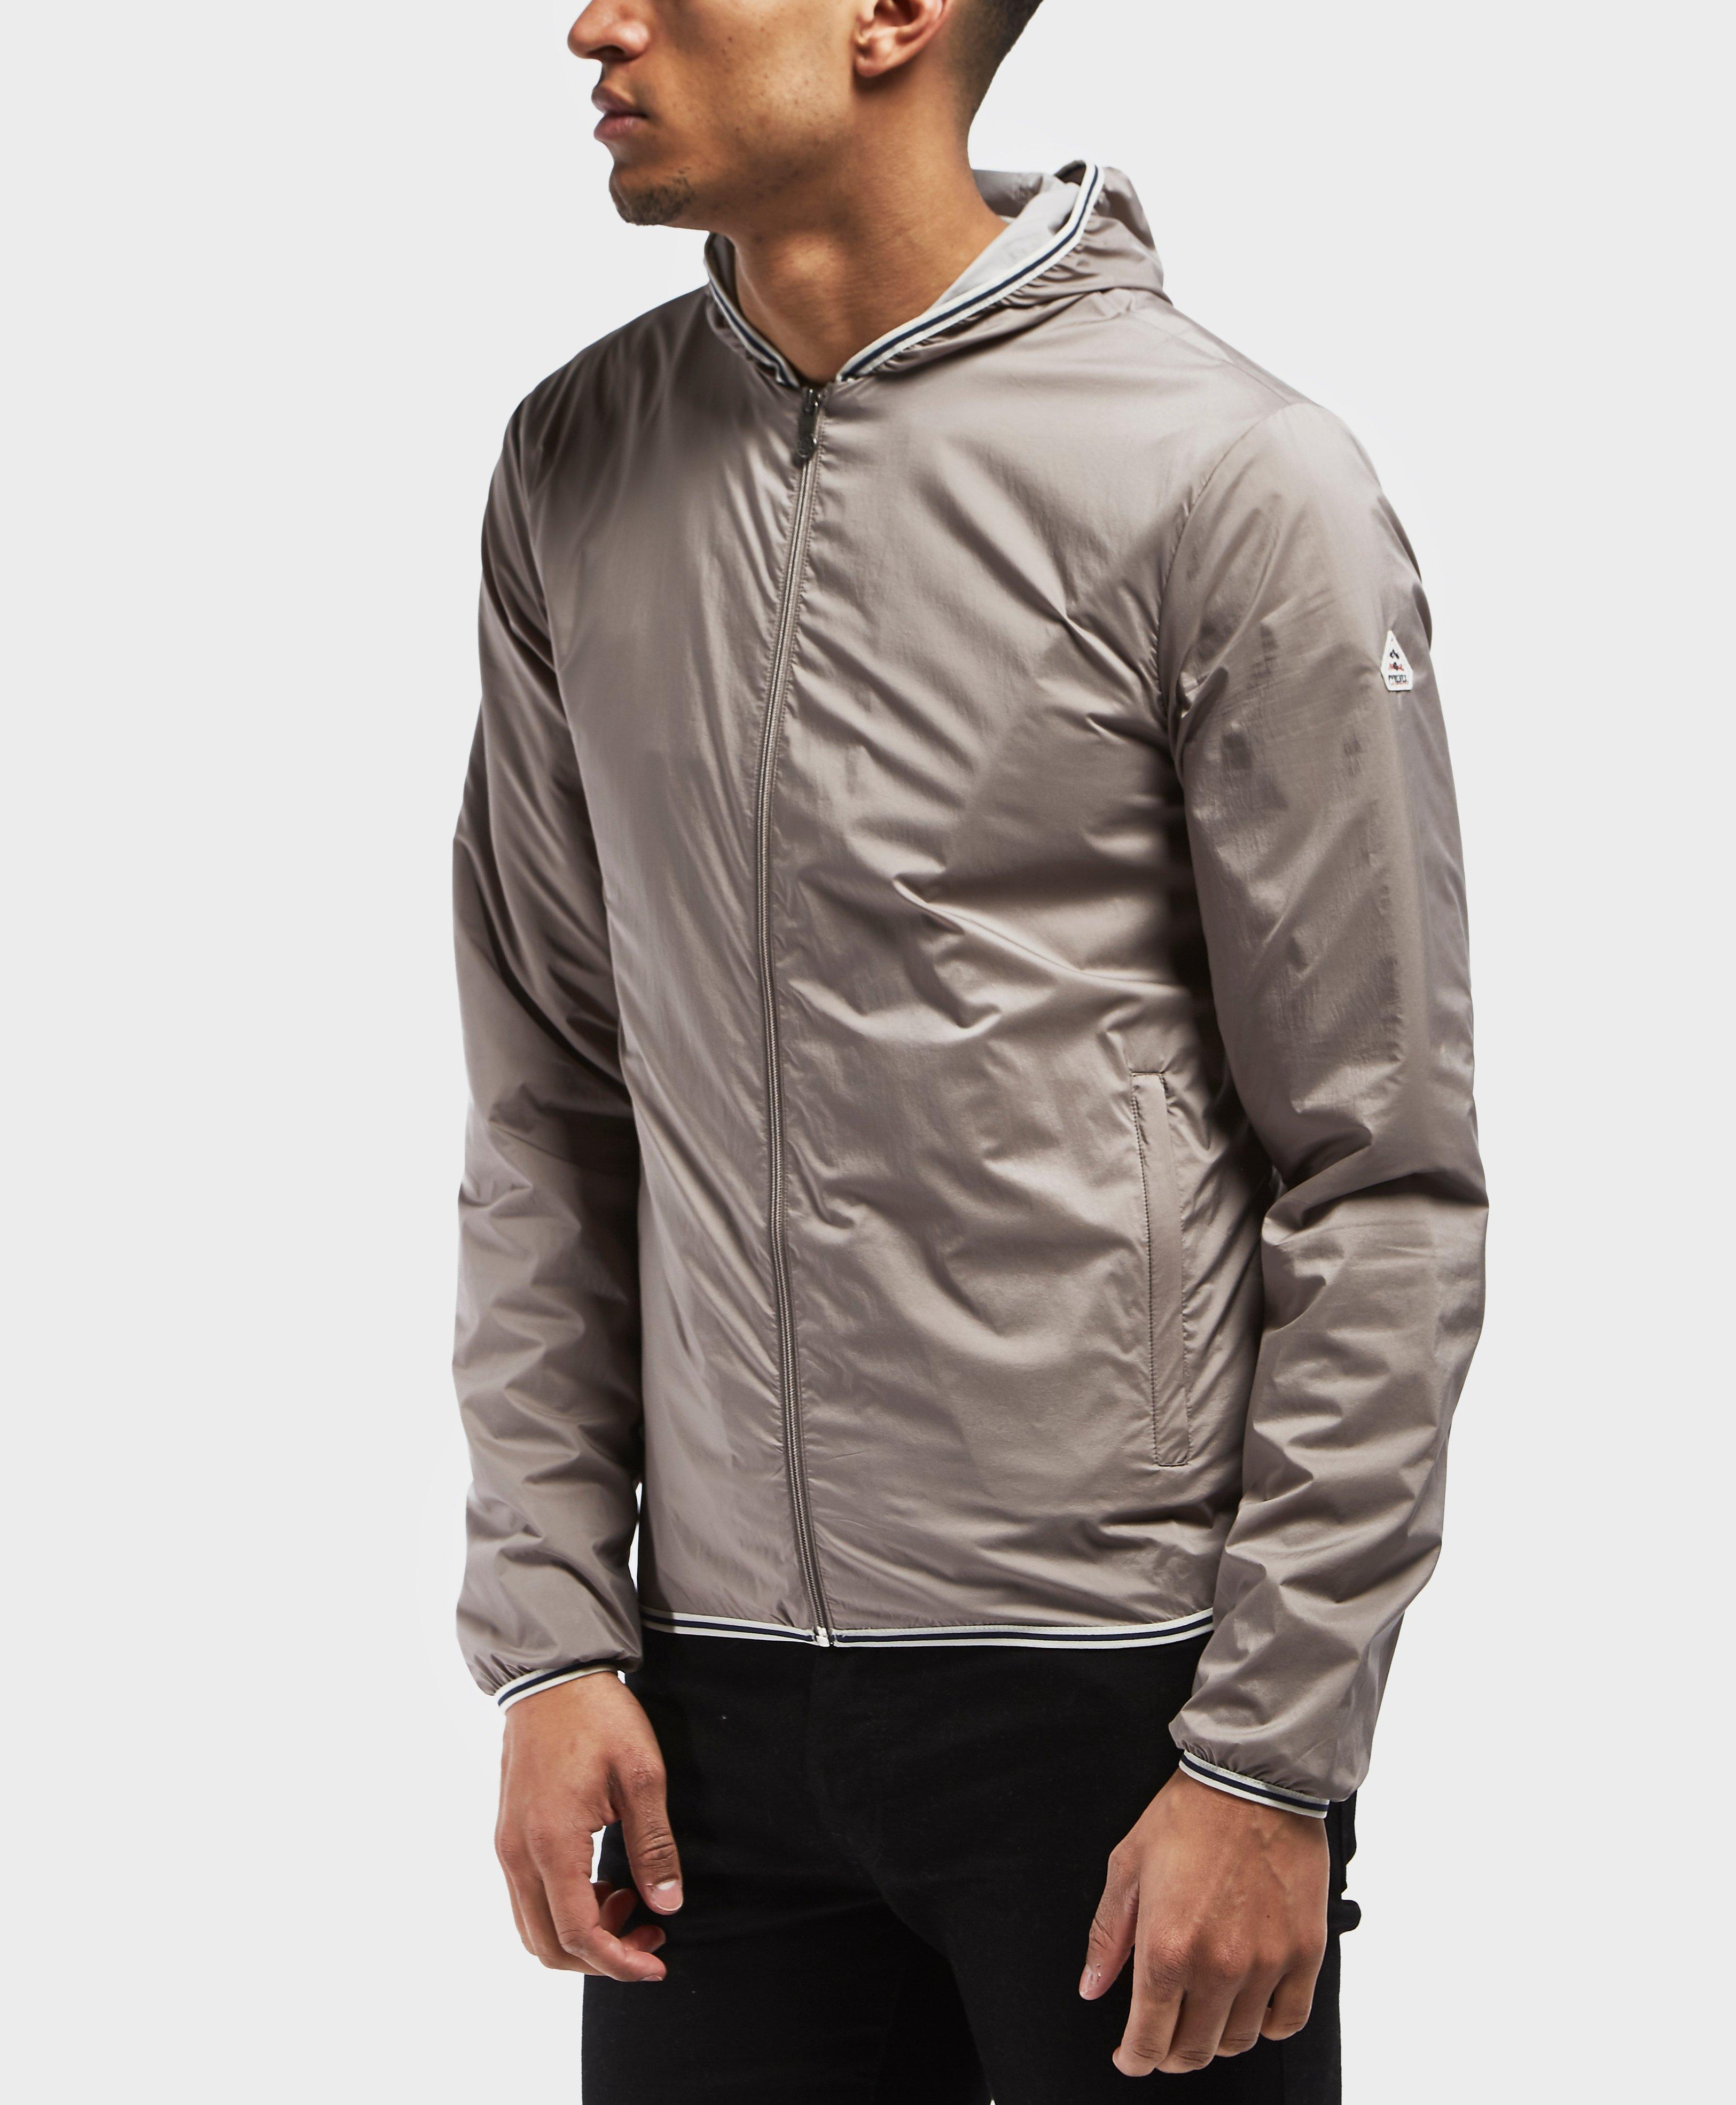 da1f38618 Pyrenex Multicolor Hendrick Lightweight Jacket for men